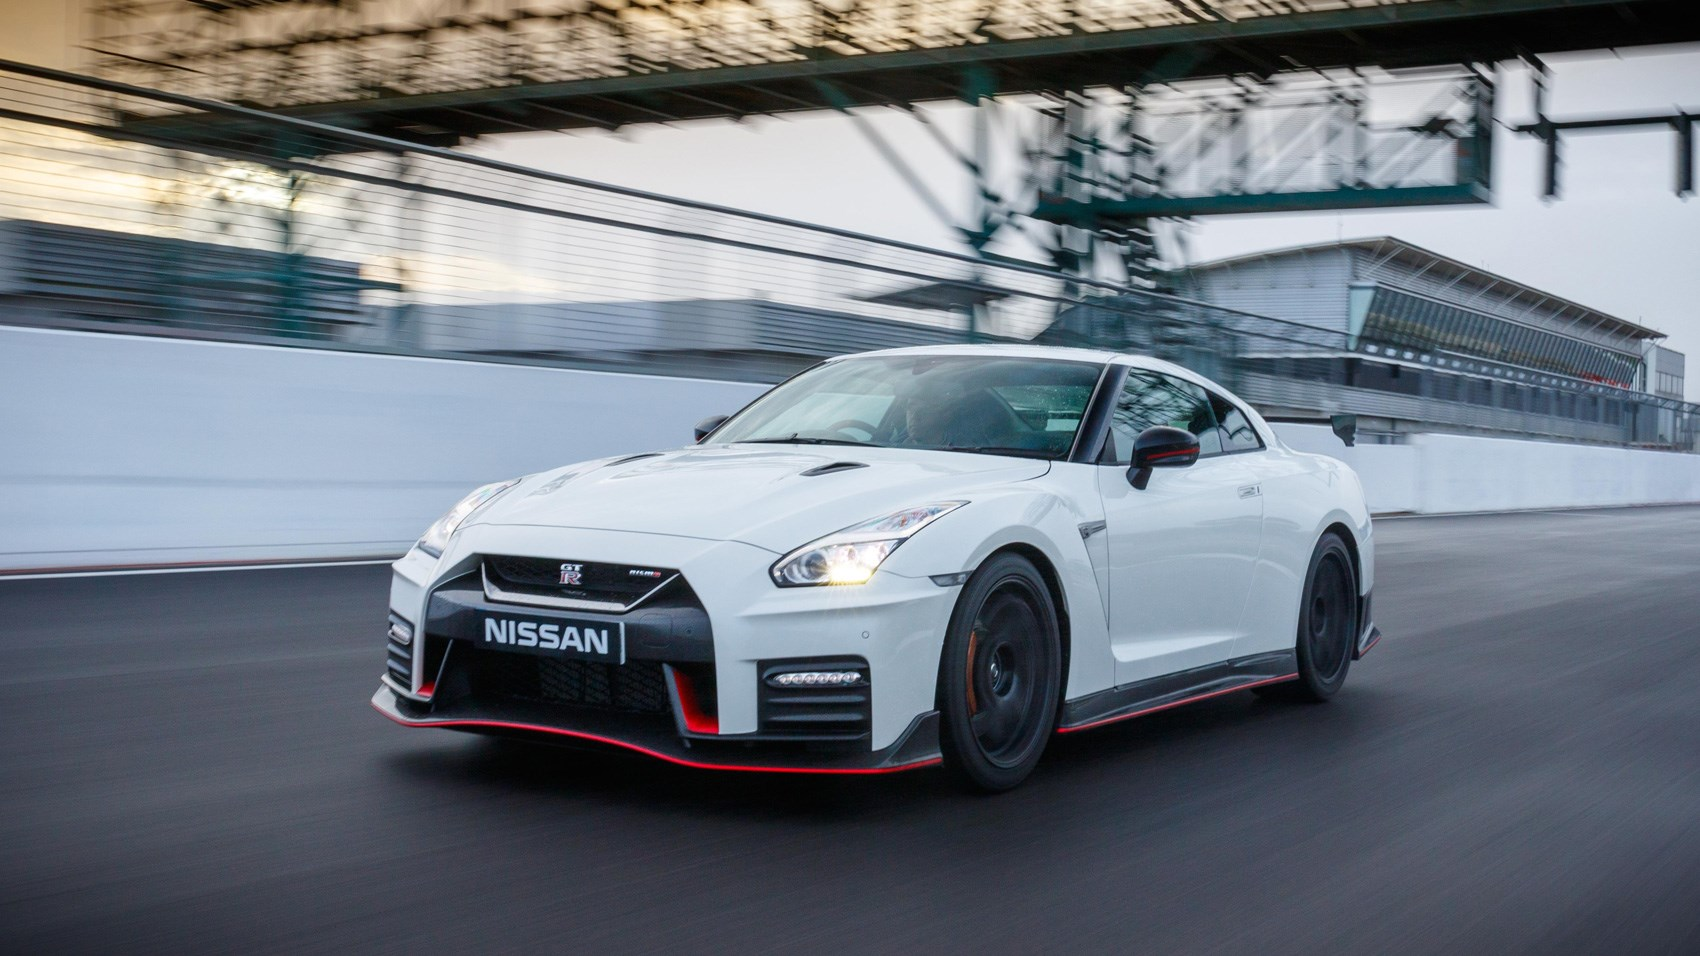 Istorija – Nissan Skyline/GTR u šest minuta (video i galerija)